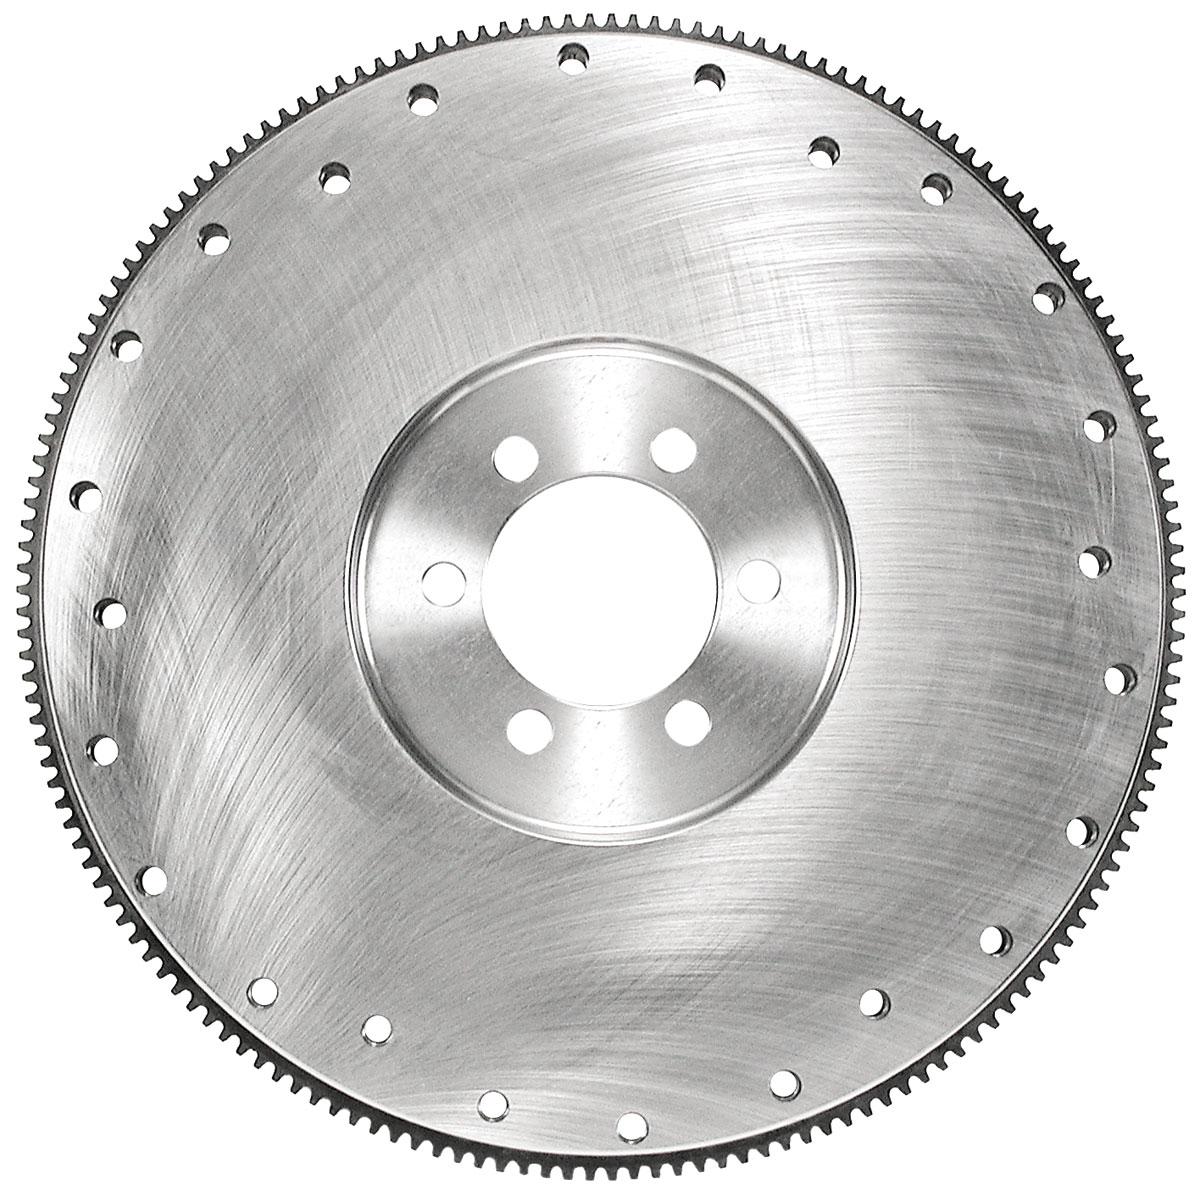 Photo of Flywheel, Billet Steel internally balanced